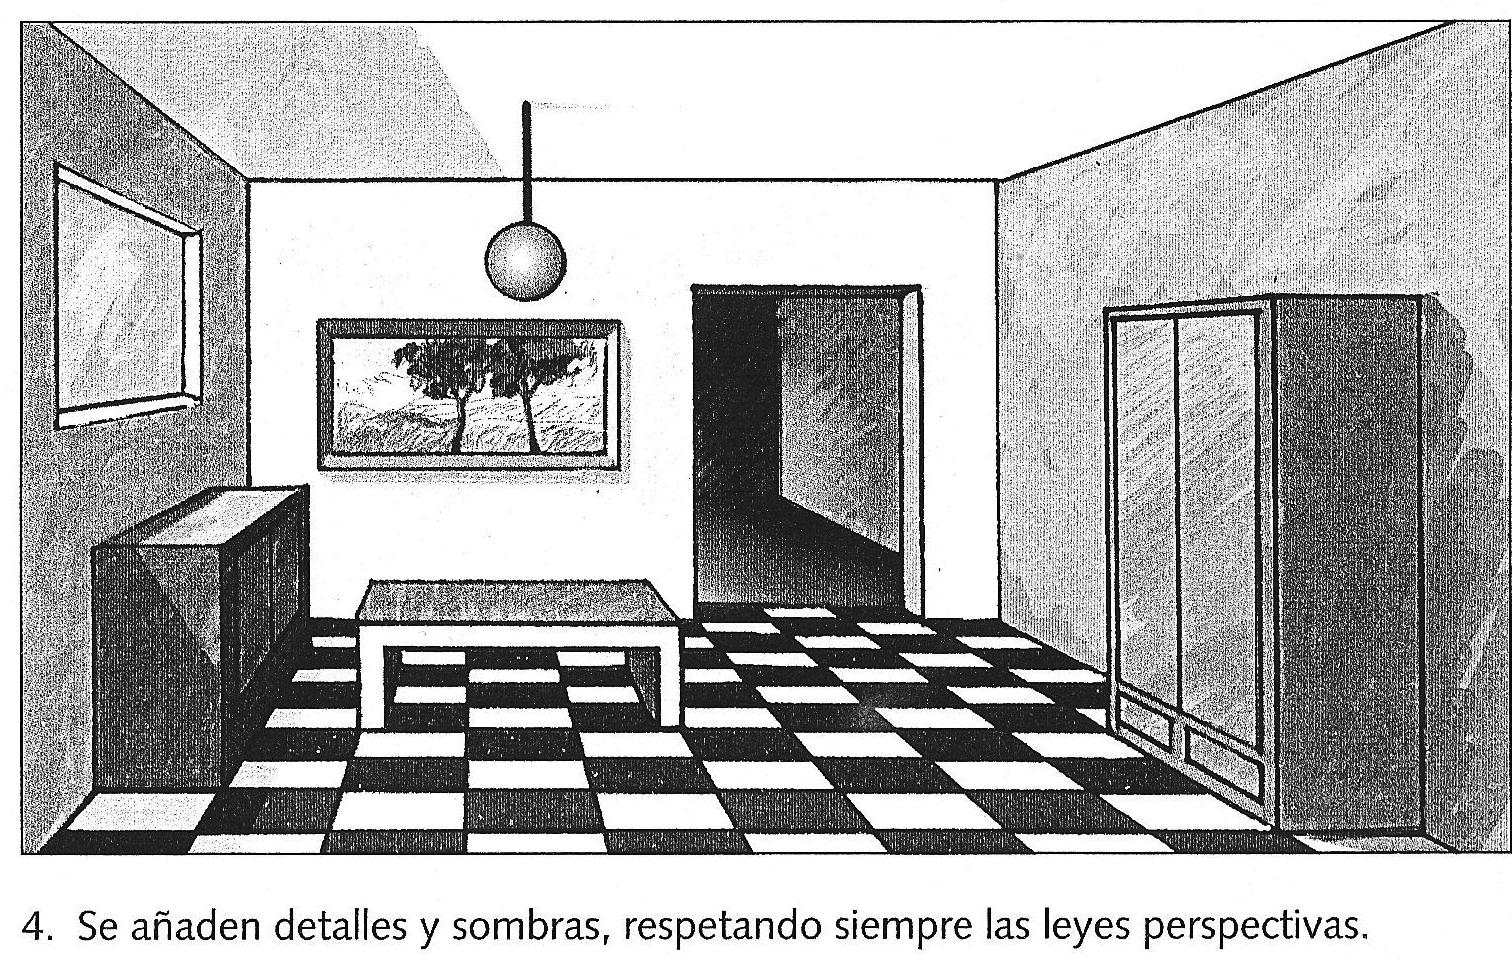 1512 966 conica pinterest perspectiva - Habitacion en perspectiva conica ...